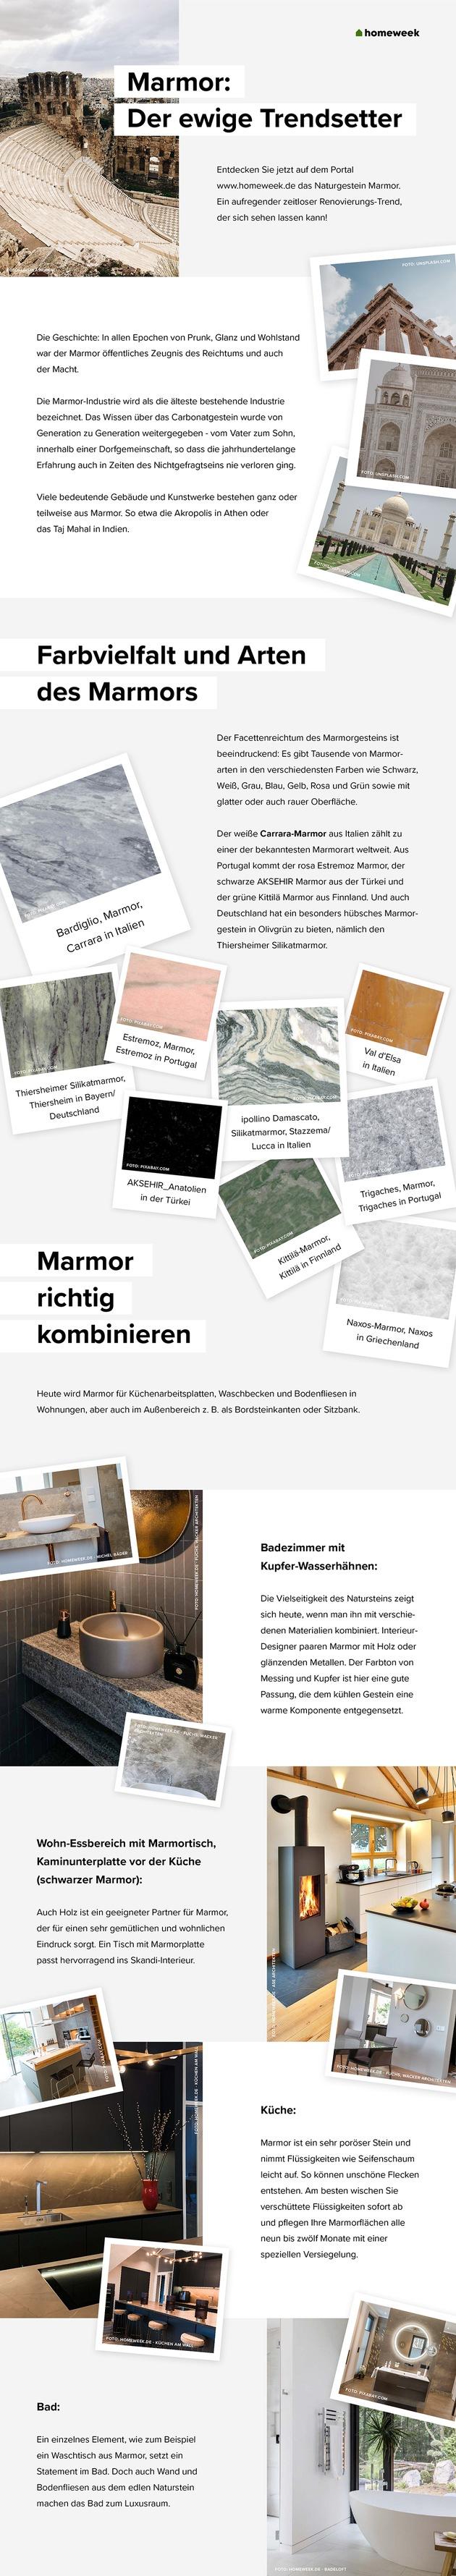 Marmor Der Ewige Trendsetter Presseportal